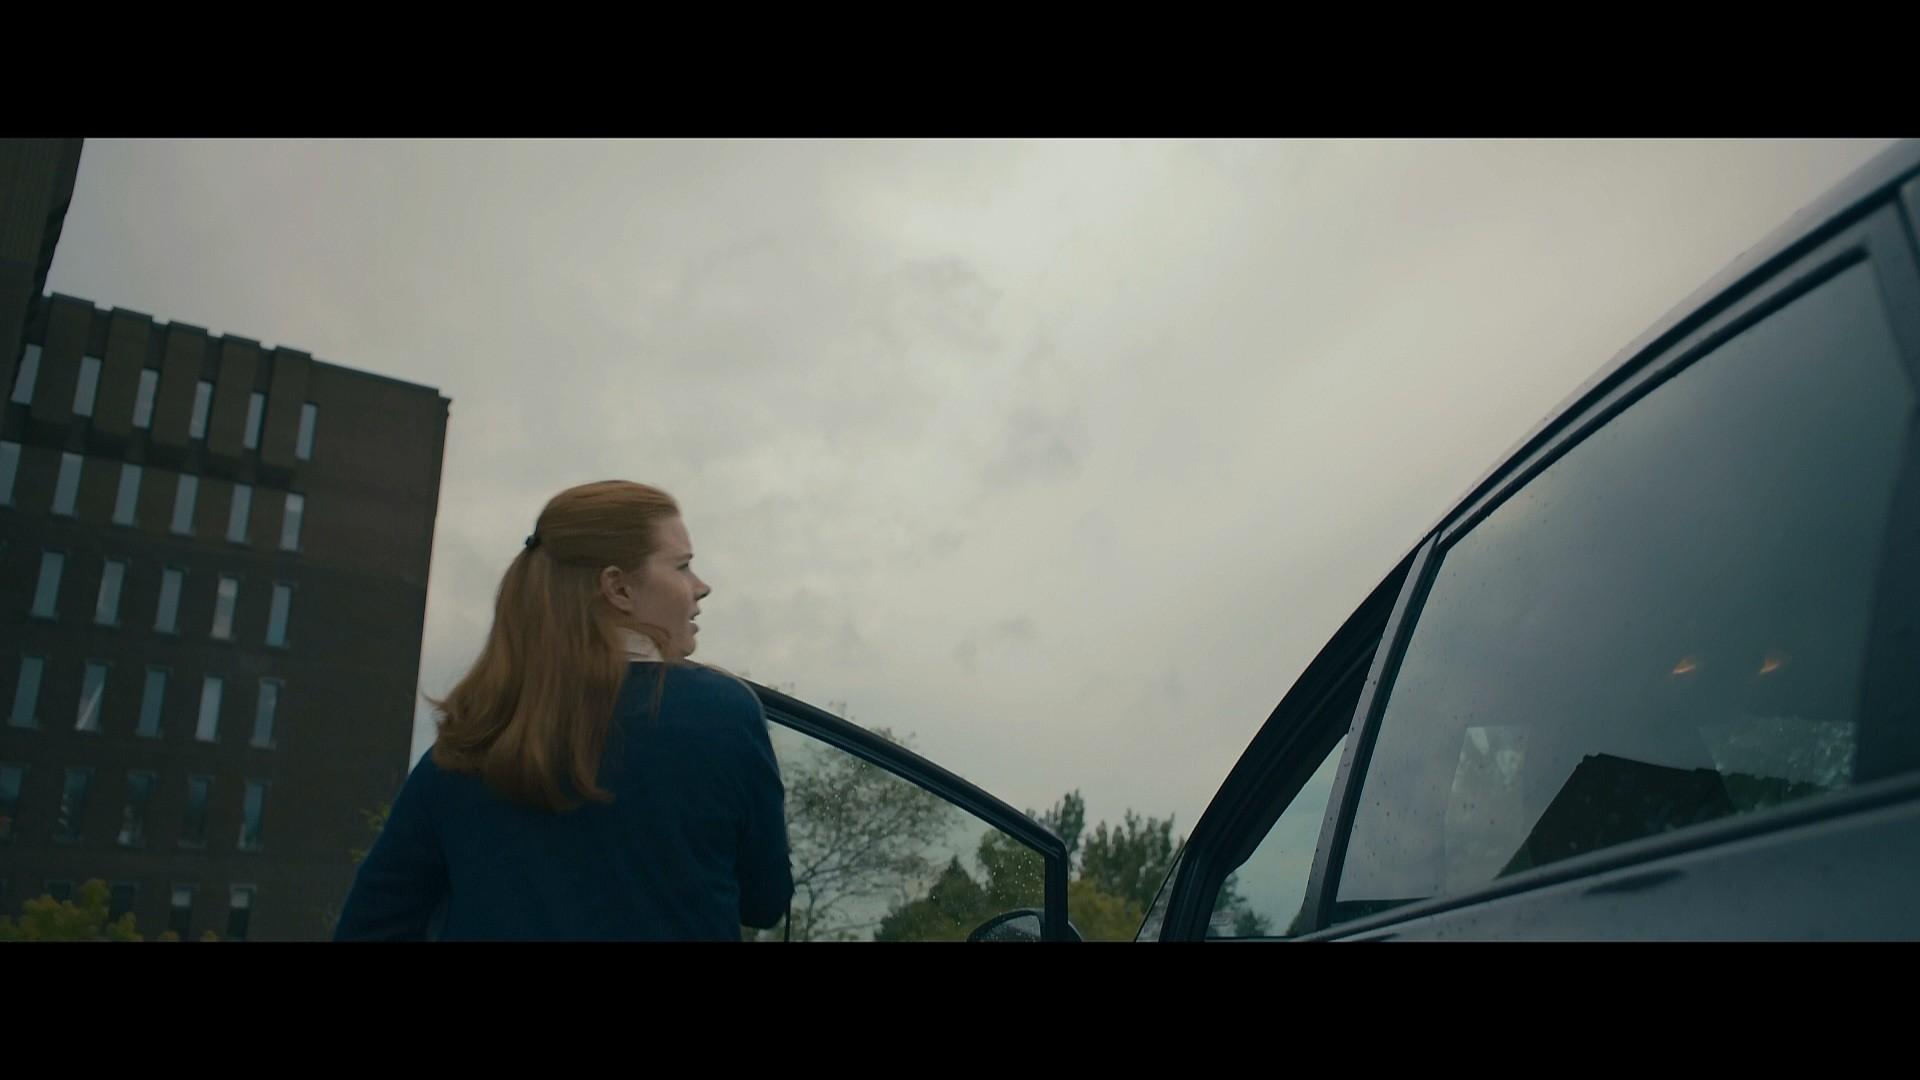 La llegada comparativa trailer-original